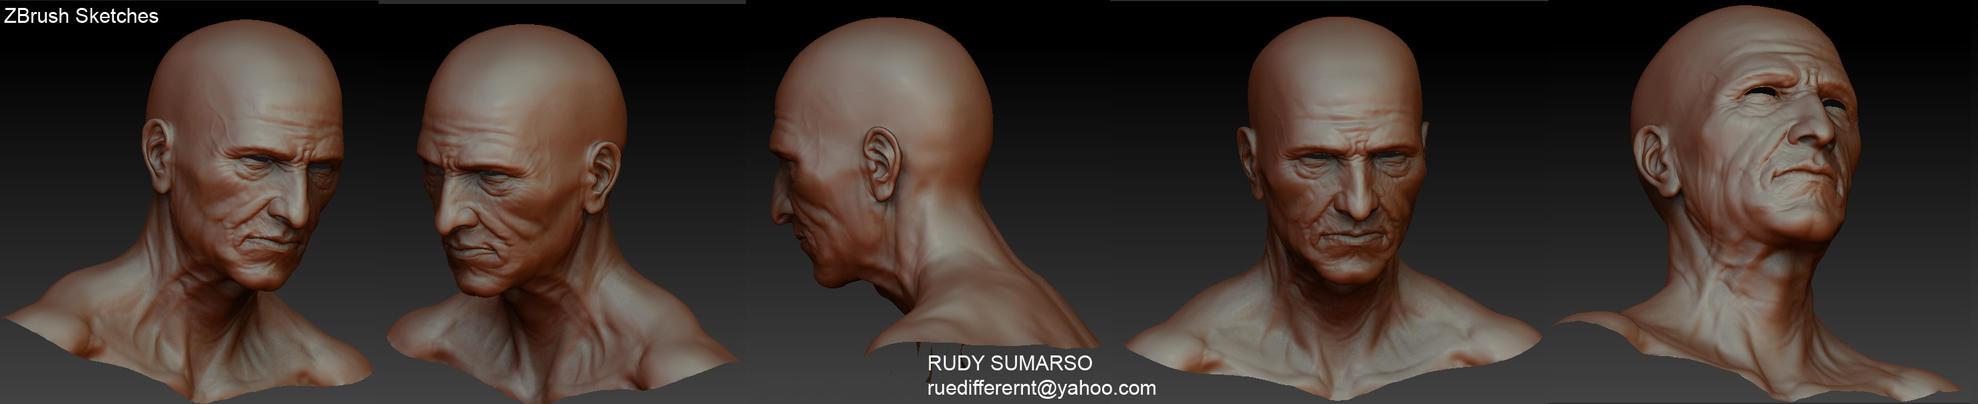 oldman_sculpt by rue-different